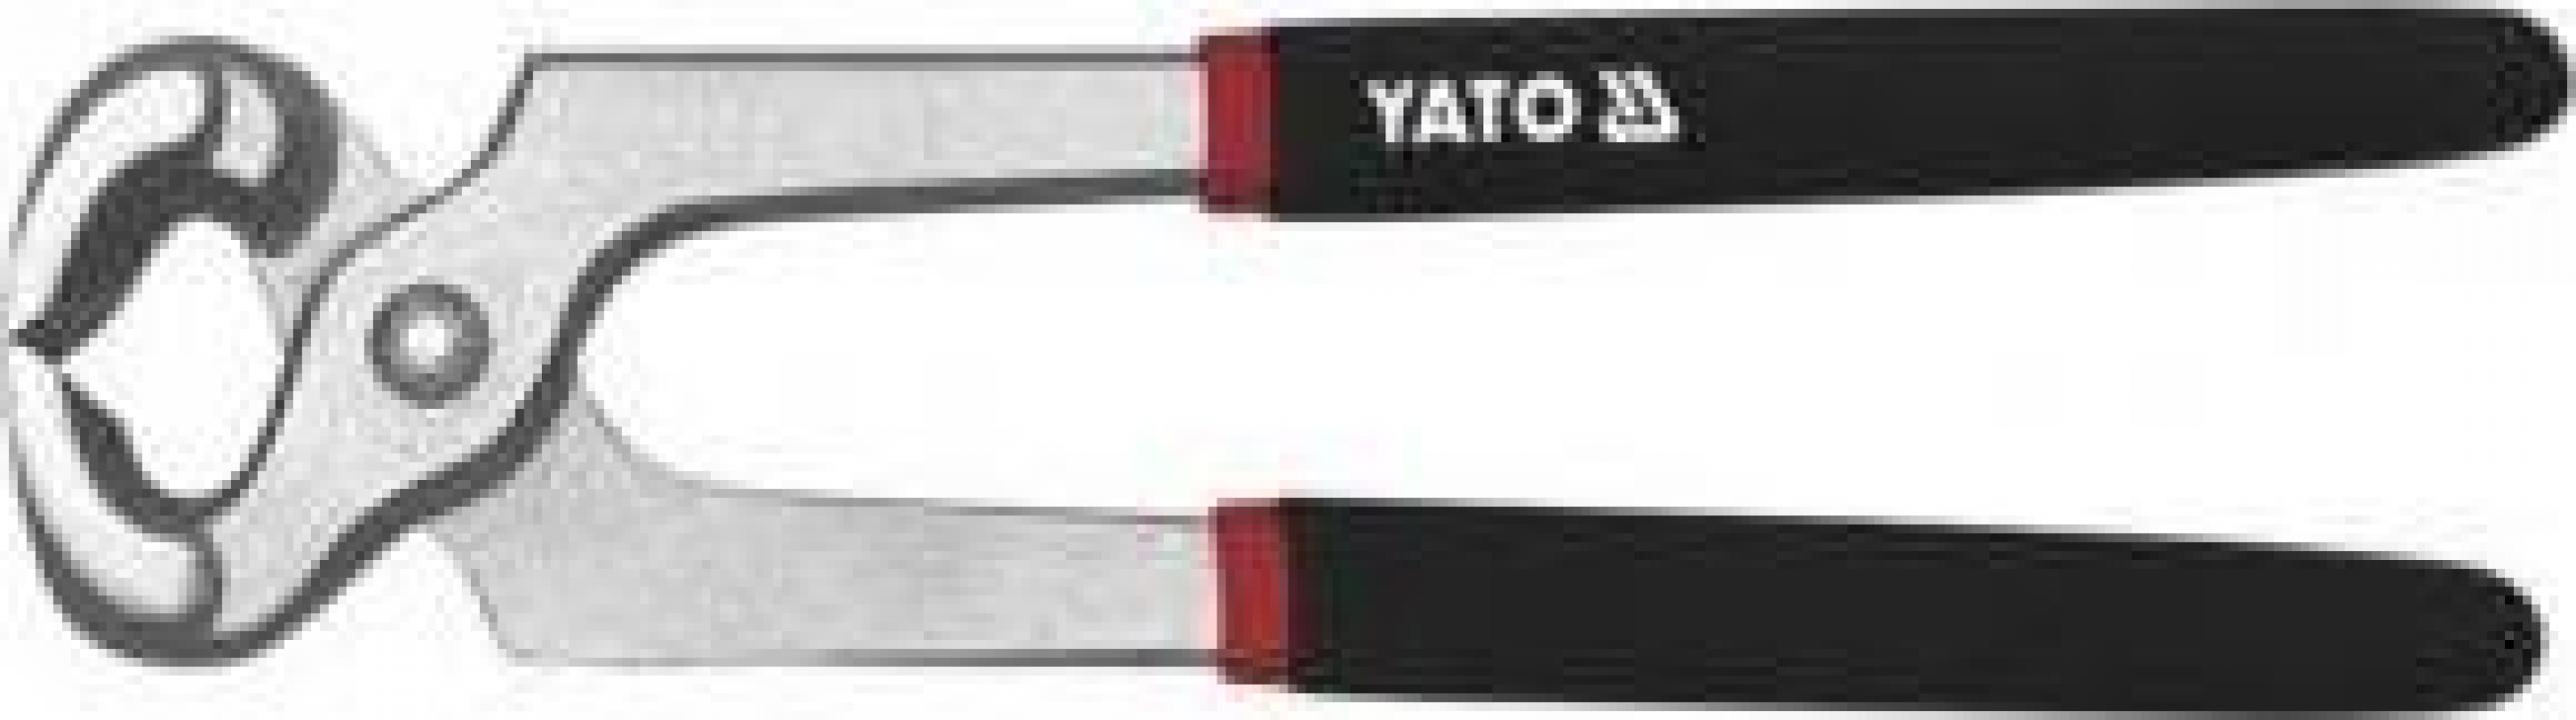 Cleste pentru cuie, 180 mm, Yato YT-2047